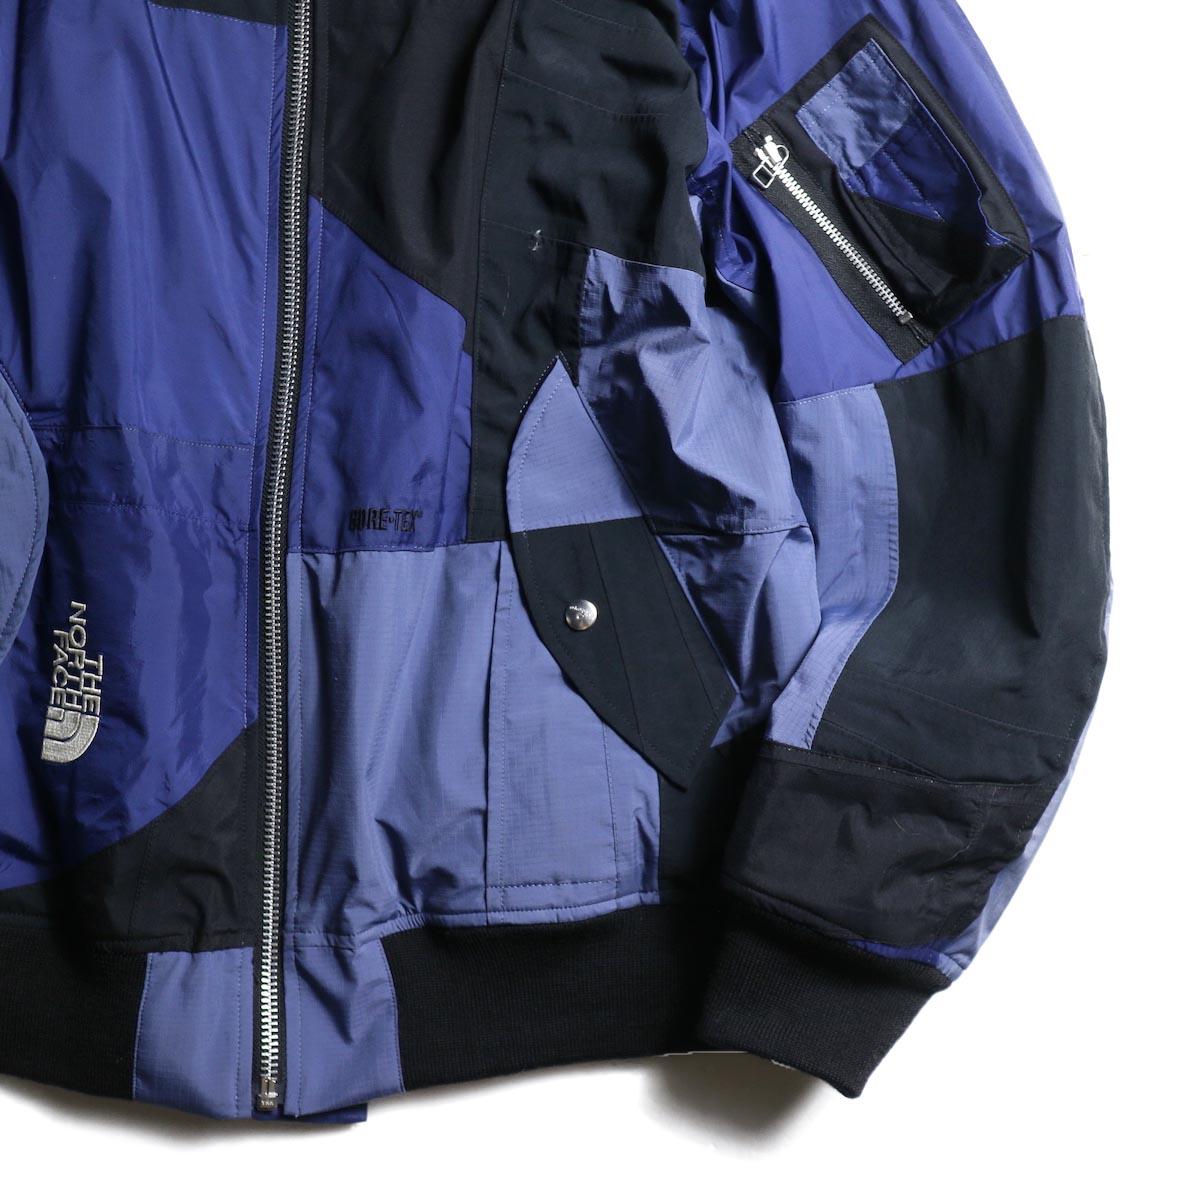 OLD PARK / Flight Jacket (OUTDOOR)(XLsize) 袖、裾